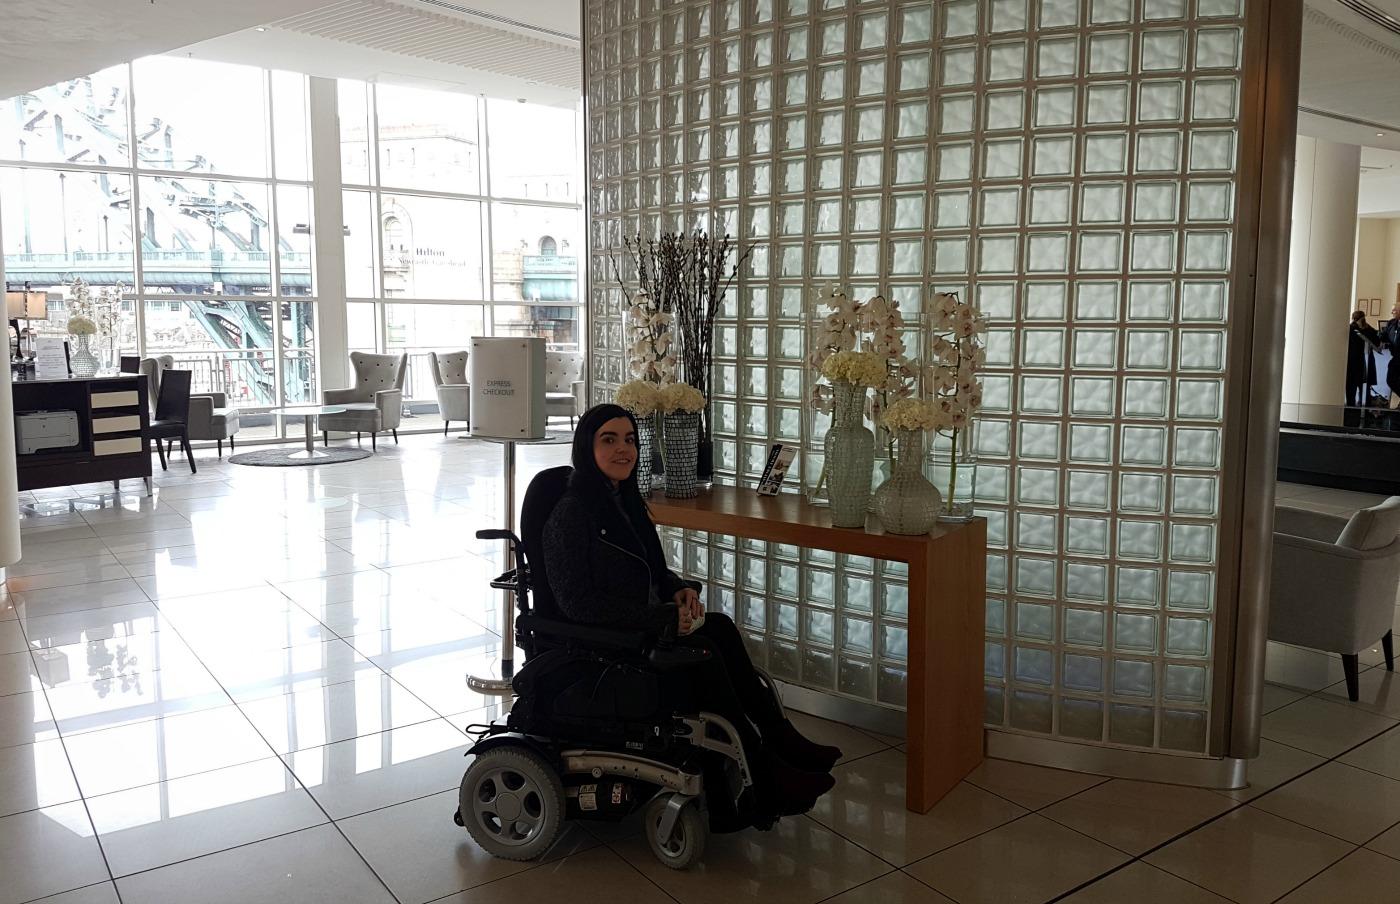 hilton-newcastle-gateshead-wheelchair-accessible-hotel